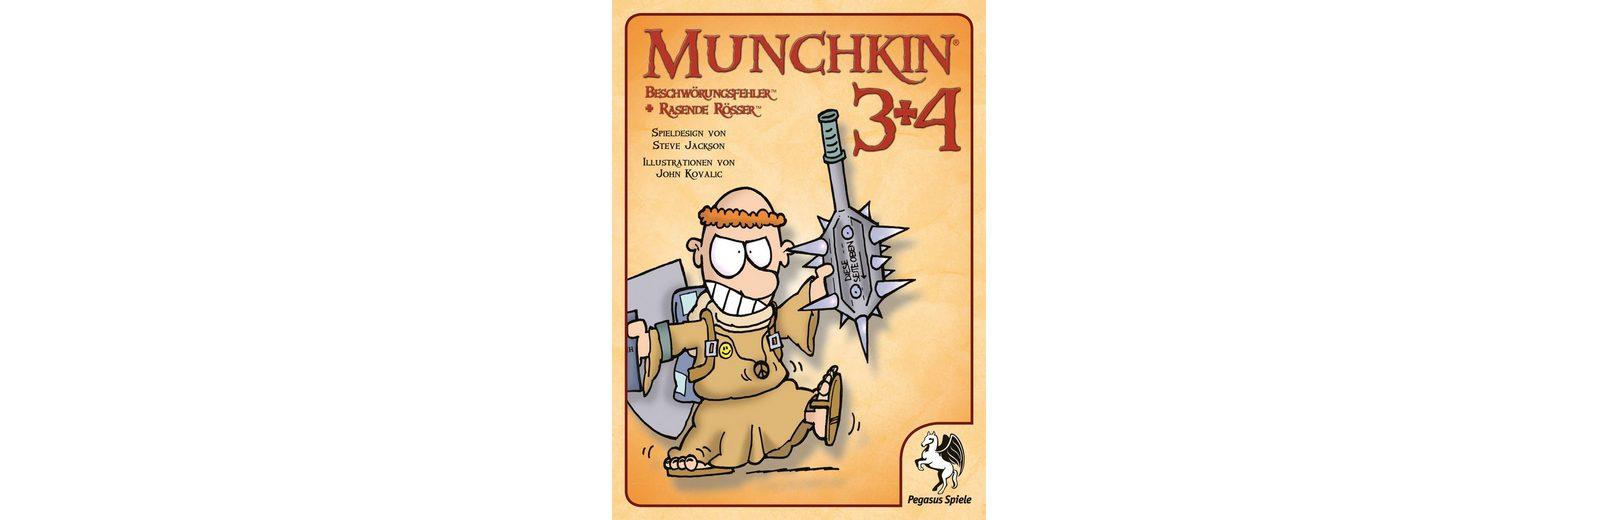 Pegasus Spiele Kartenspiel, »Munchkin 3+4«